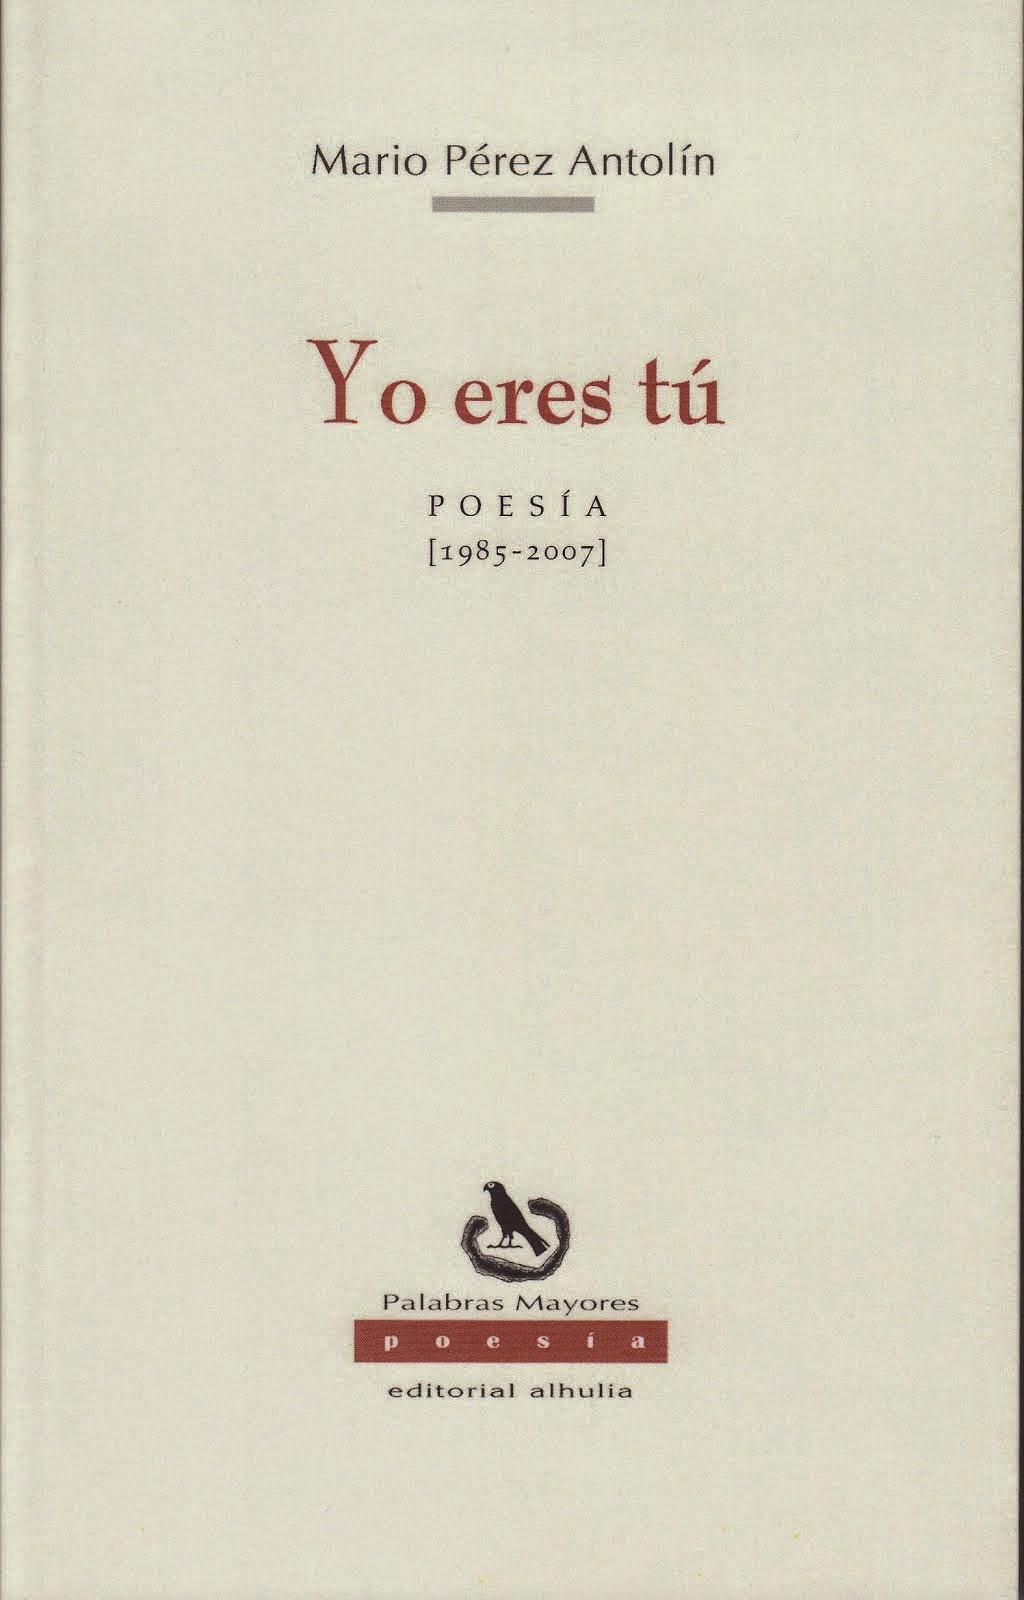 YO ERES TÚ. POESÍA (1985-2007)